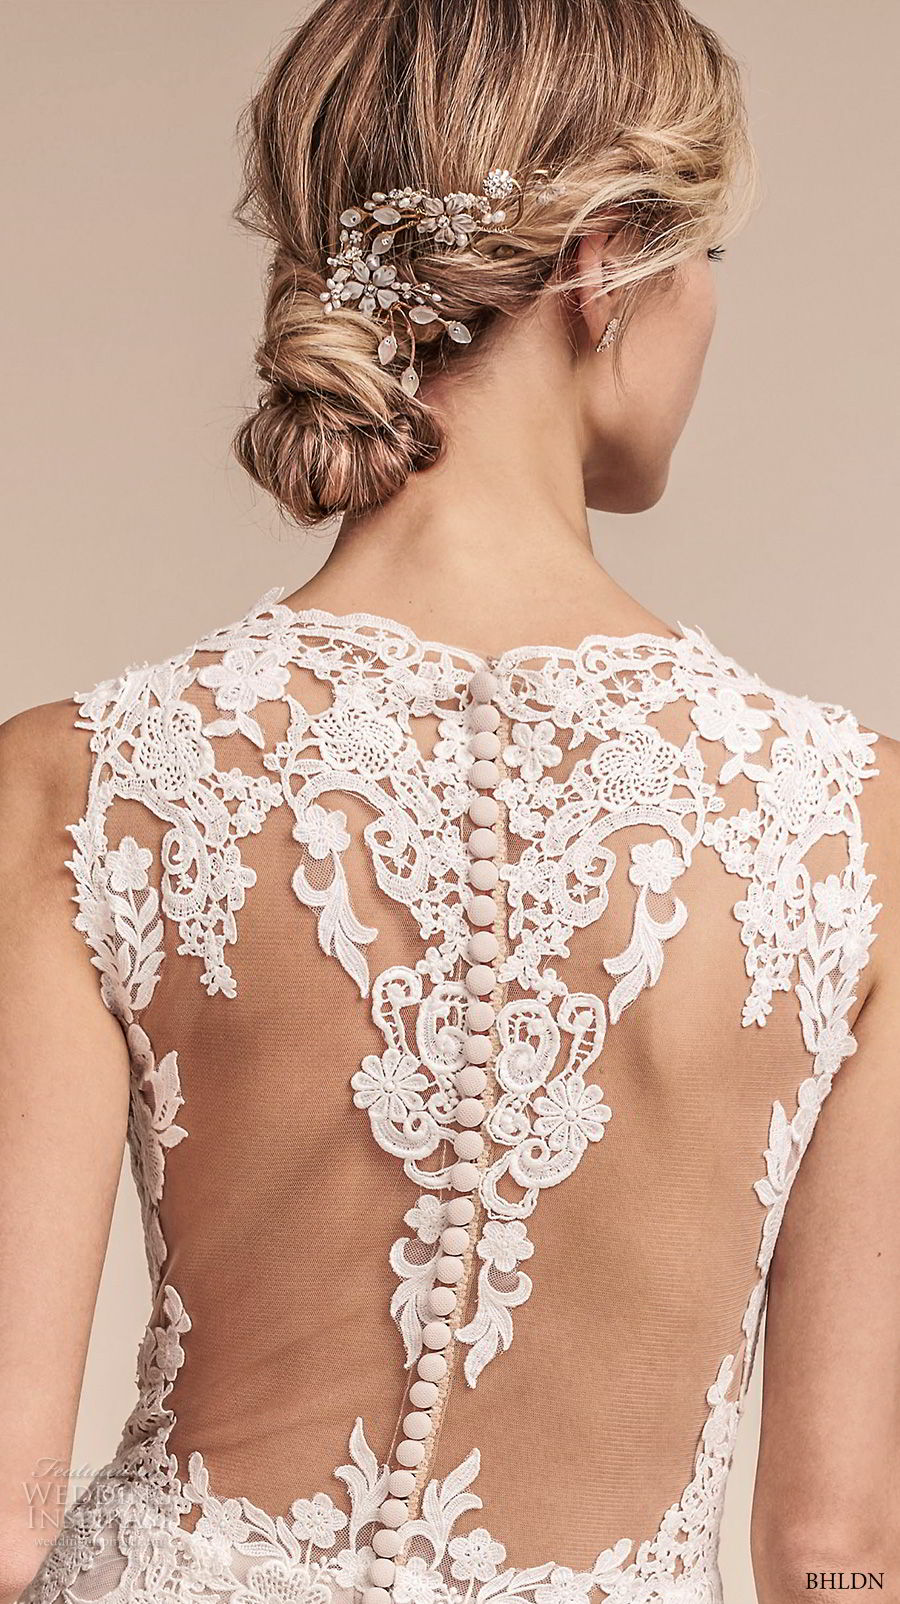 bhldn fall 2017  americana bridal sleeveless embroidered strap heavily embellished bodice elegant romantic sheath a  line wedding dress lace back short train (monarch) zbv